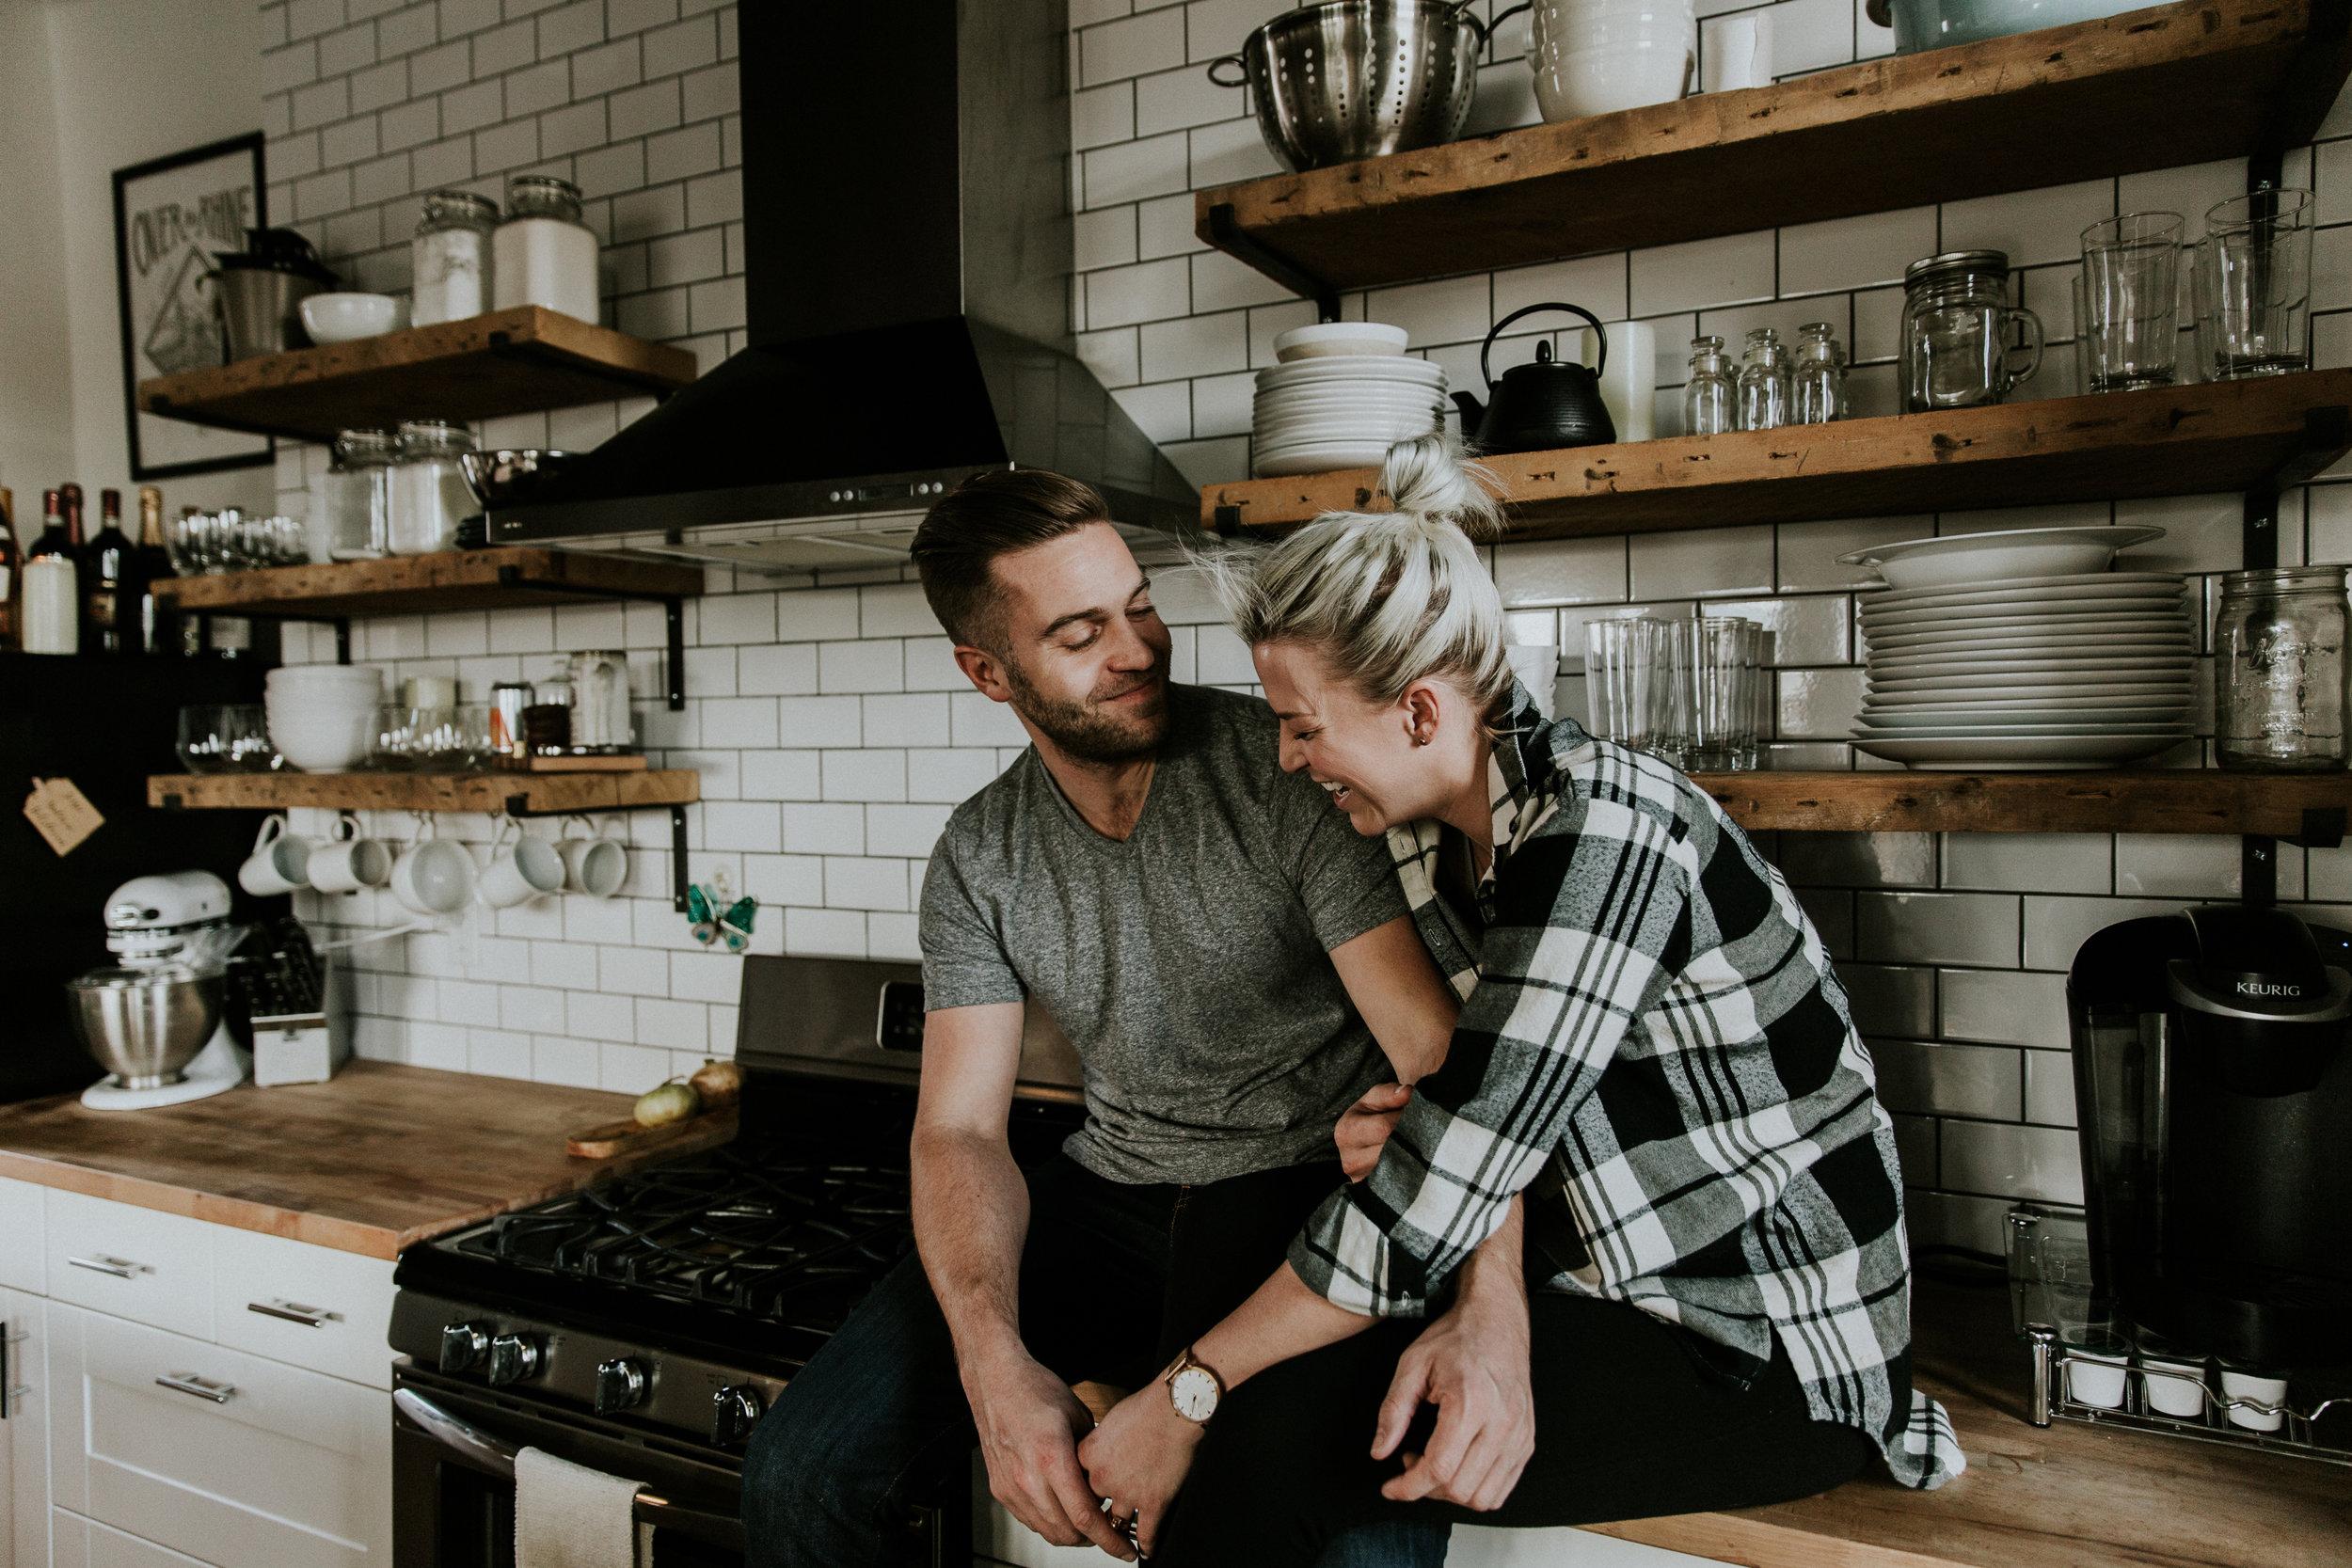 Jessie_and_Andrew-Cincinnati-Engagement-EDIT-31.jpg